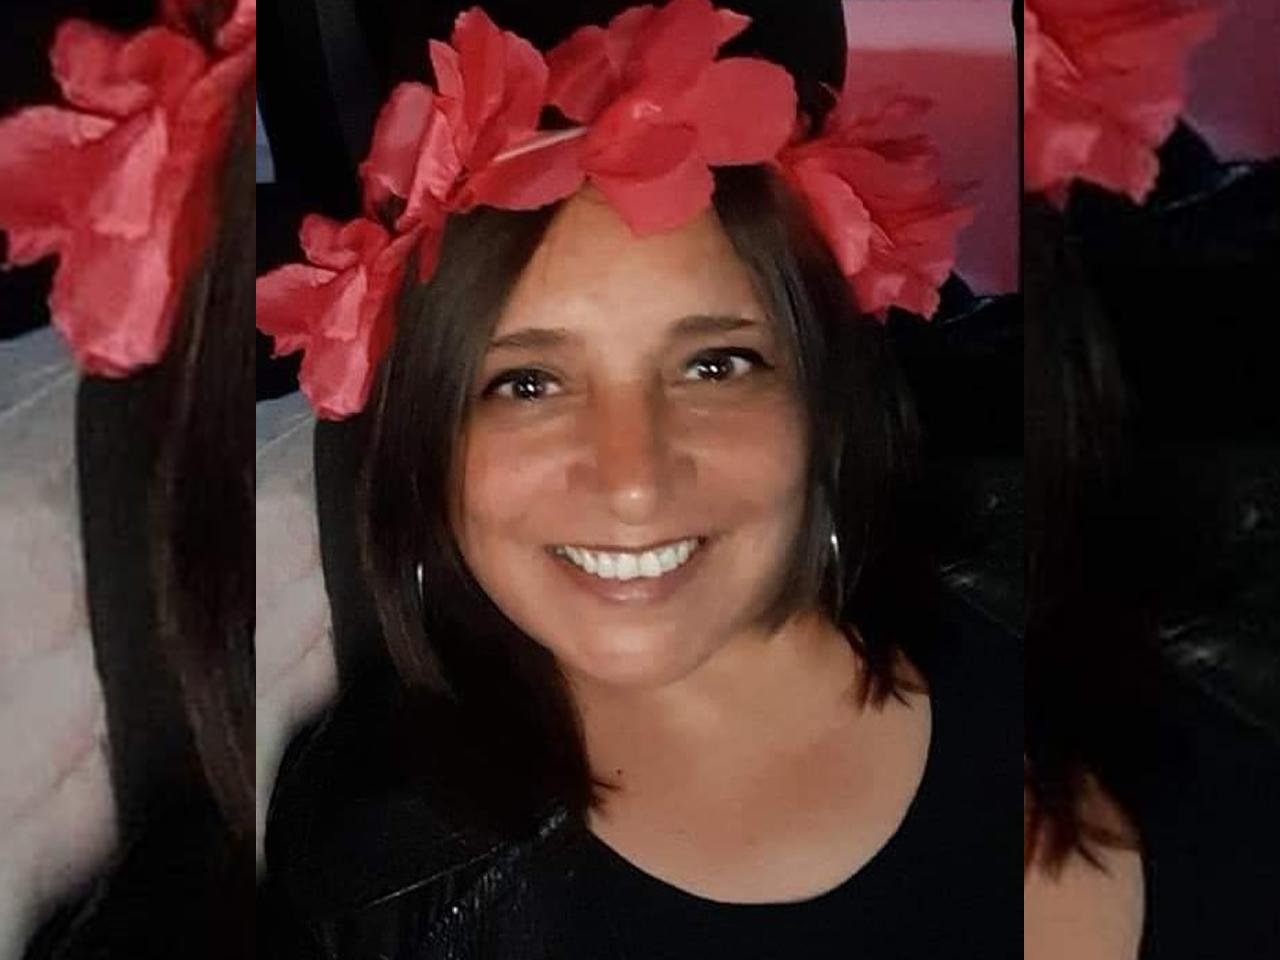 SAN FELIPE: Profesora Sandra Pizarro Jeria falleció este viernes en el Hospital San Camilo